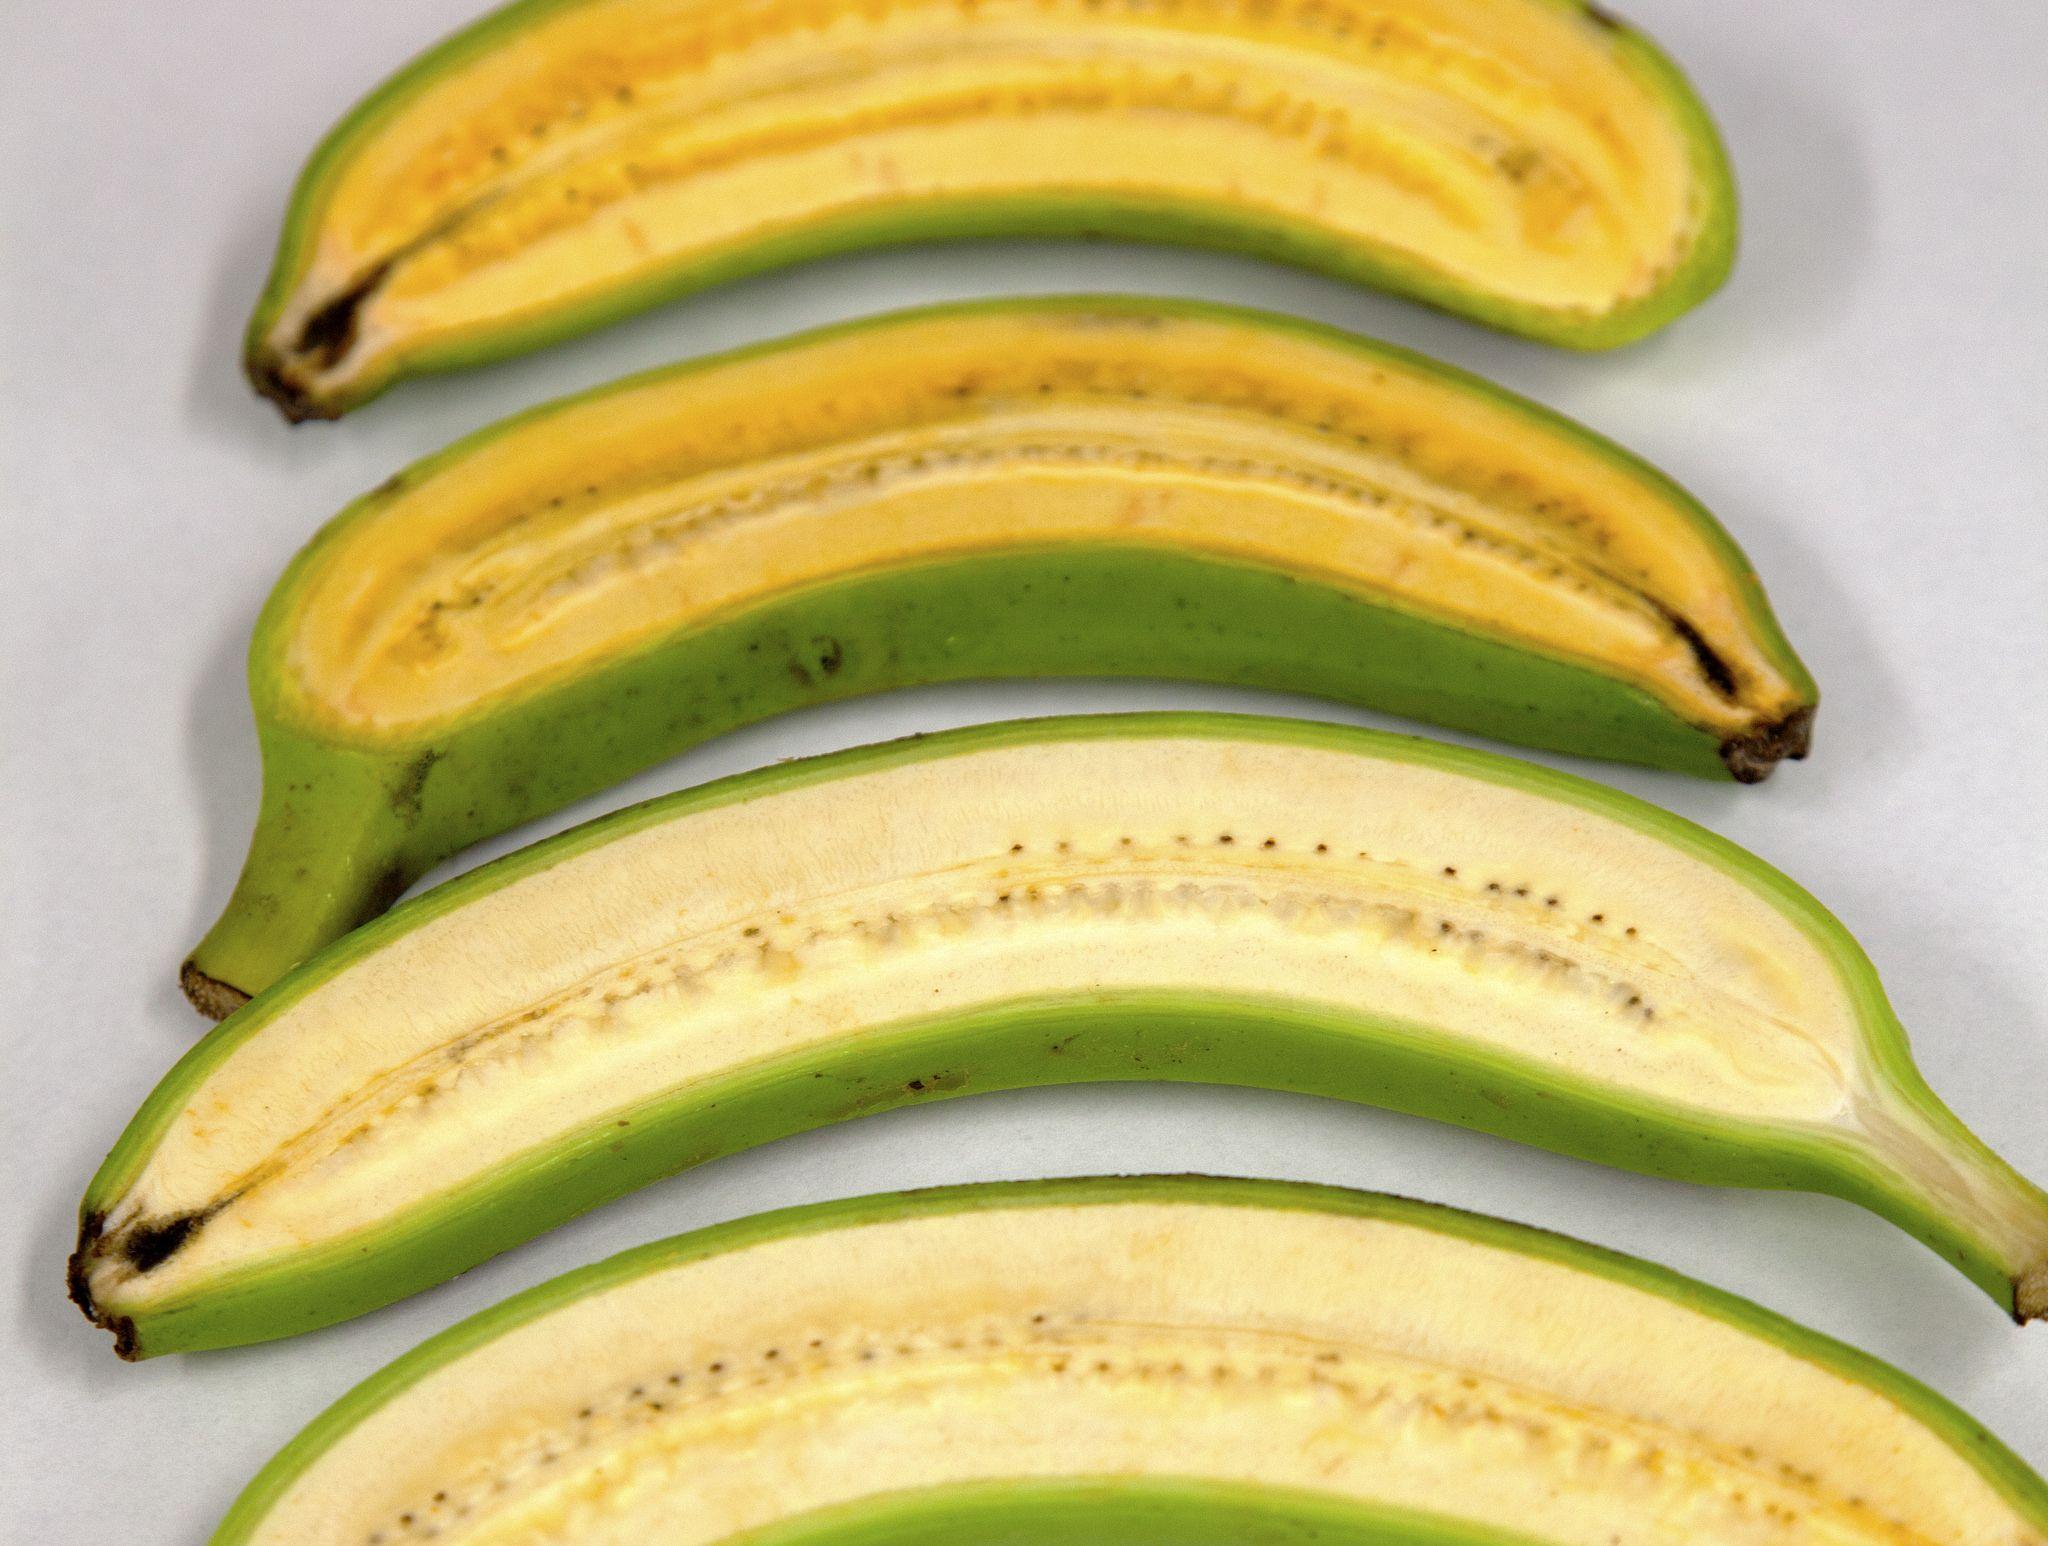 Yes, We Need No GMO Bananas | HuffPost